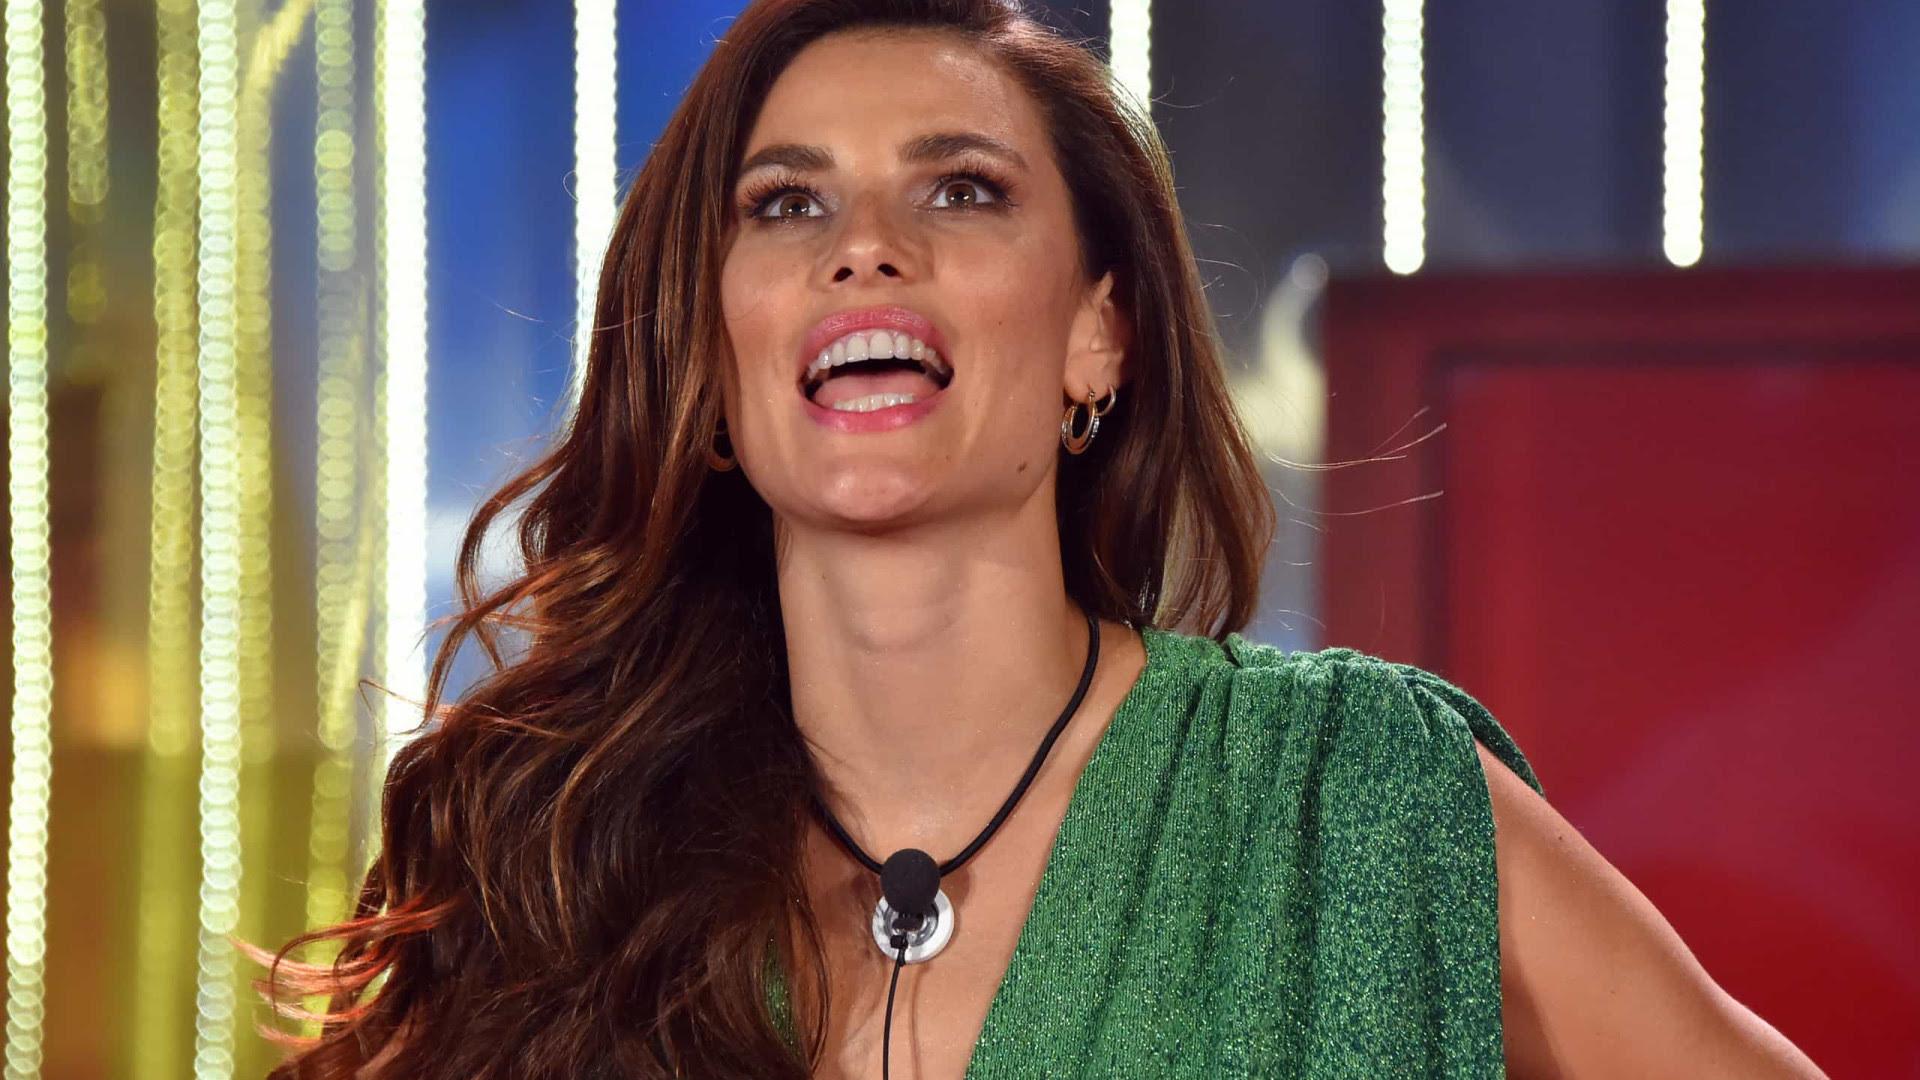 Brasileira Dayane Mello é criticada após assumir bissexualidade no Big Brother italiano